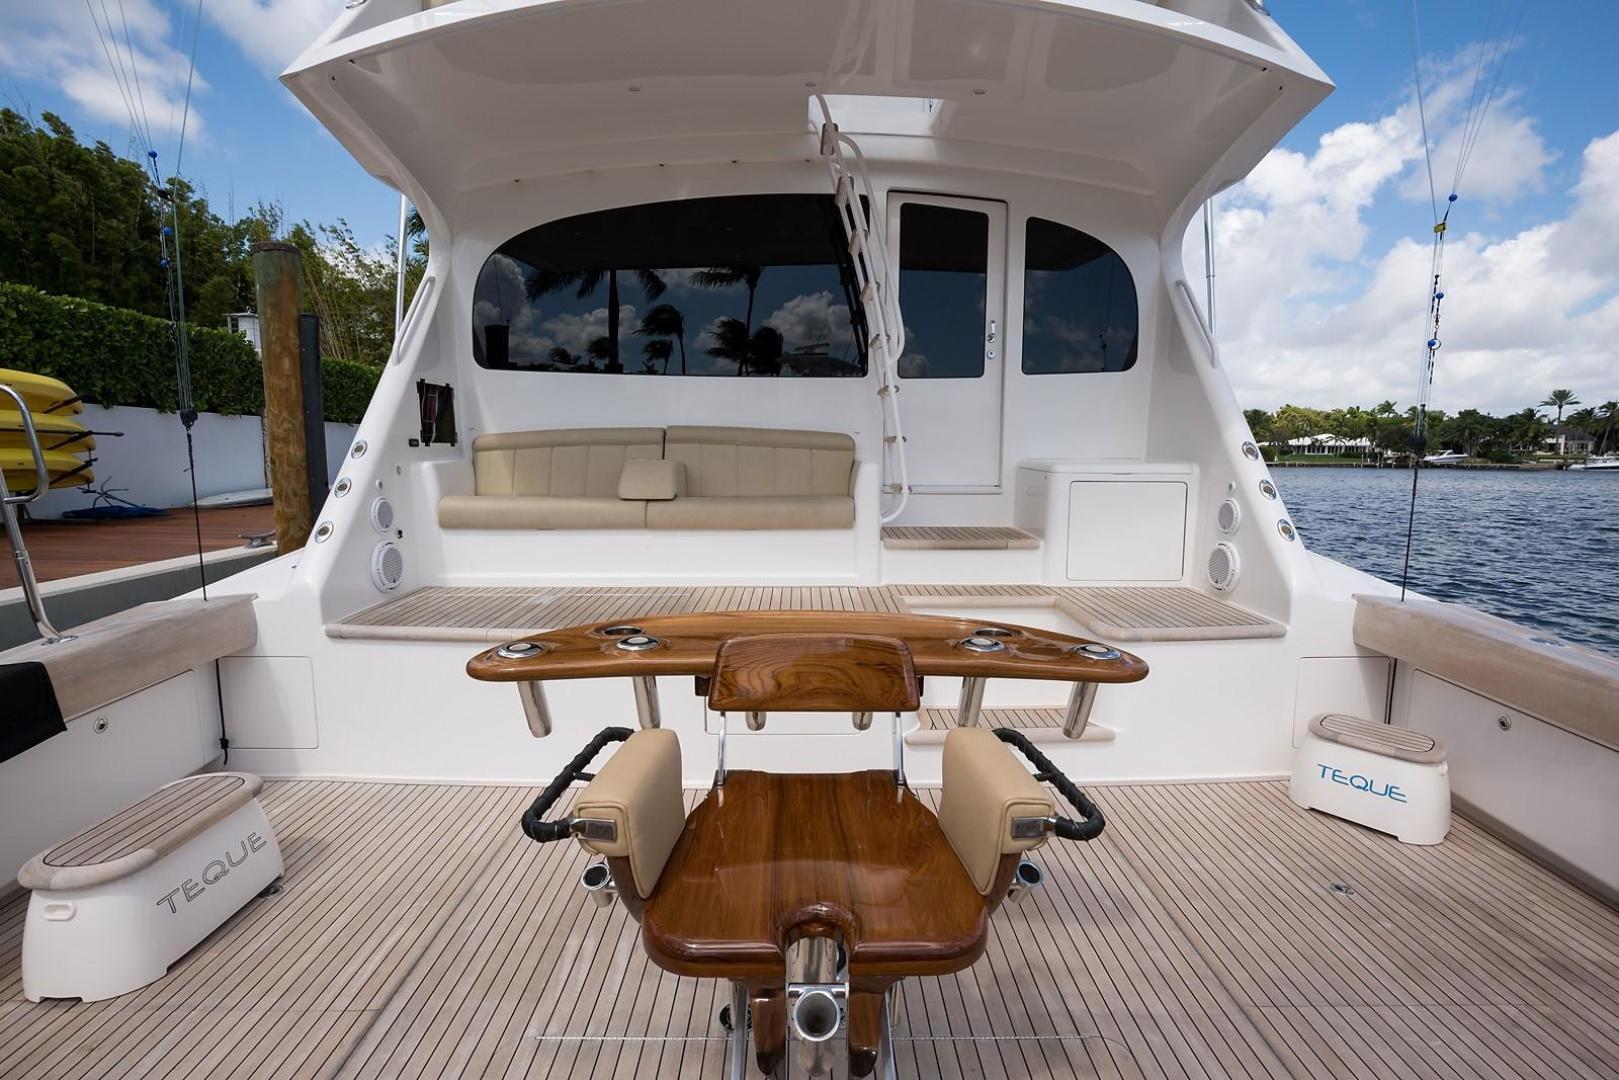 Viking-Enclosed 2013-No Name 82 Miami-Florida-United States-Cockpit-1324724 | Thumbnail